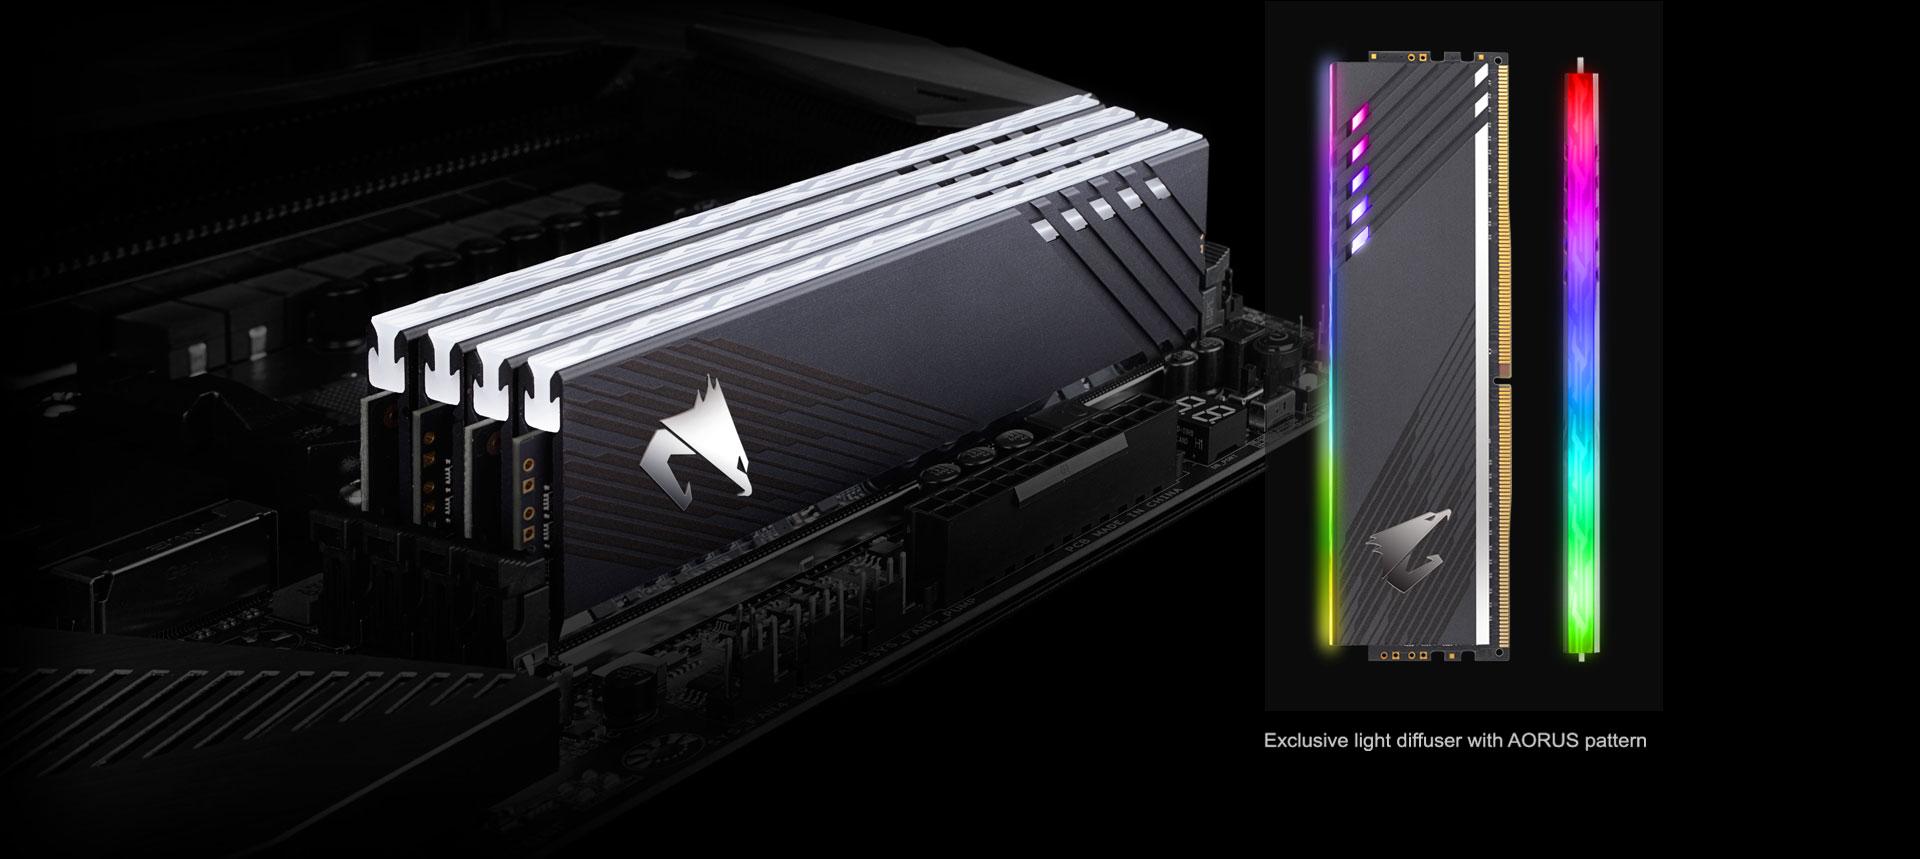 Memoria Ram Kit Gigabyte AORUS RGB 2 x 8GB + 2 RGB INFUSED DEMO MODULE  DIMM DDR4-3600